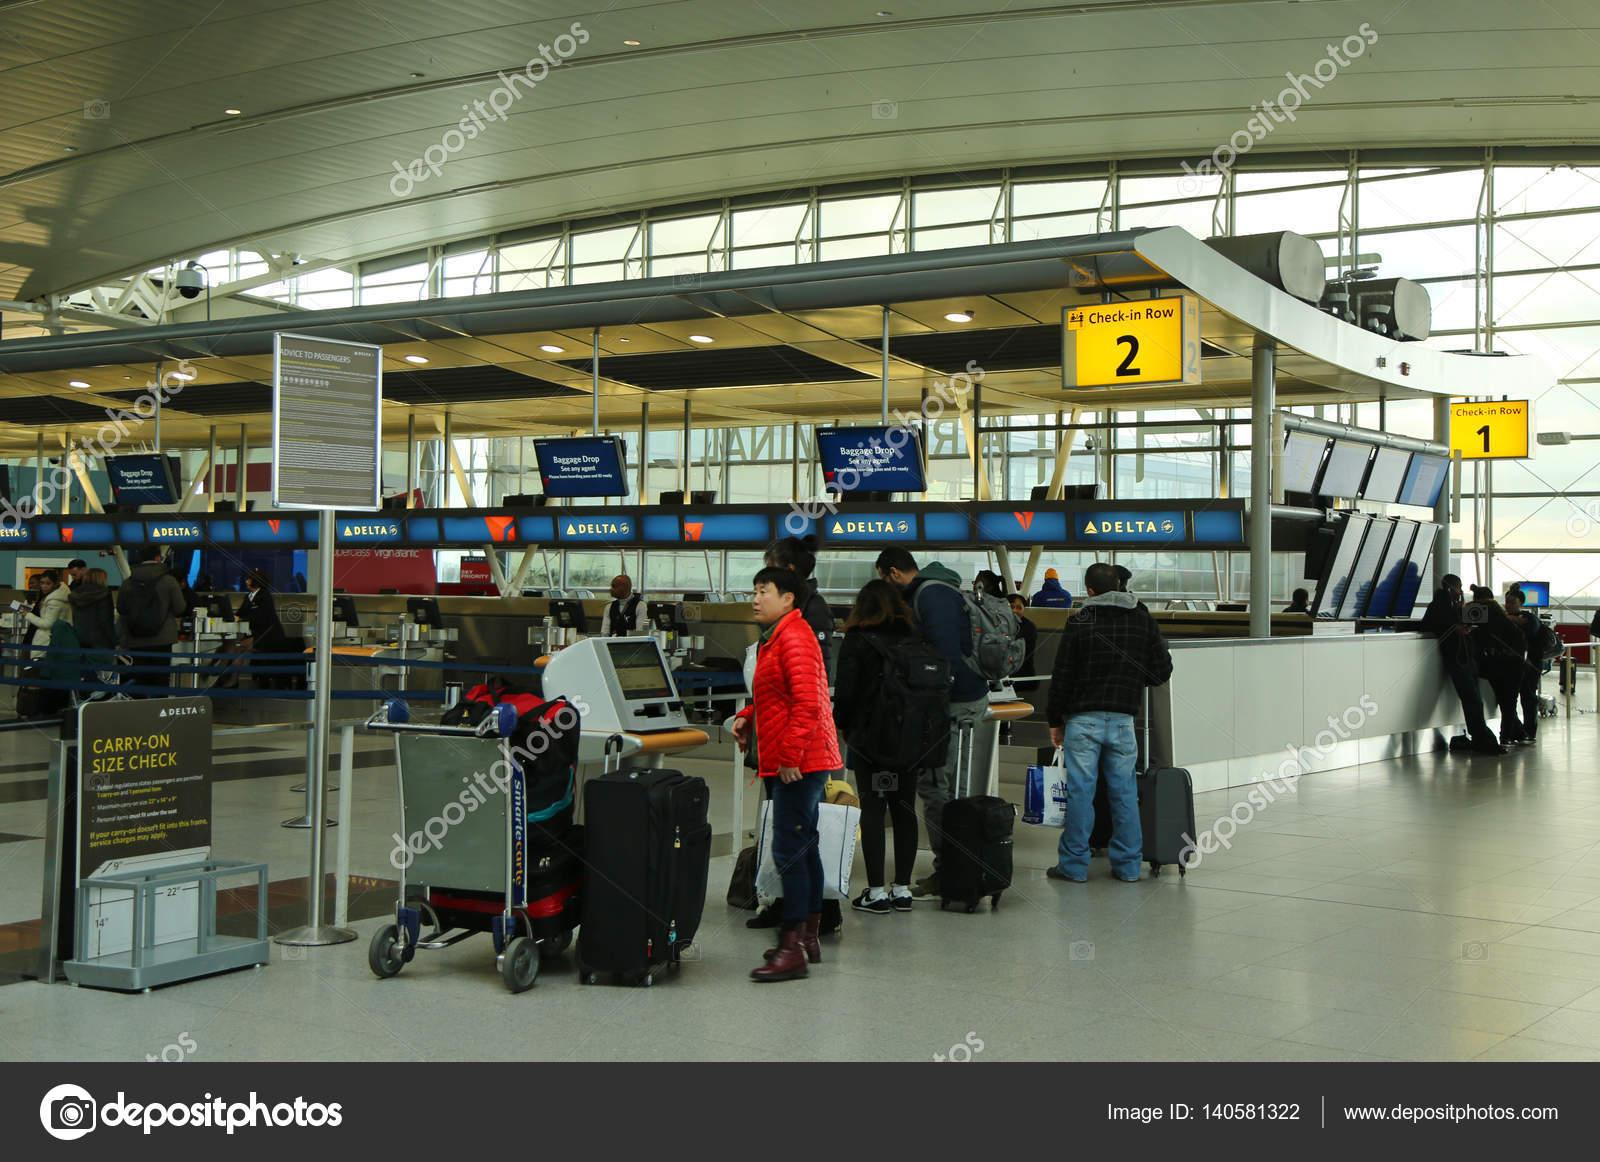 Aeroporto York : Dentro do delta airline terminal 4 no aeroporto jfk em nova york